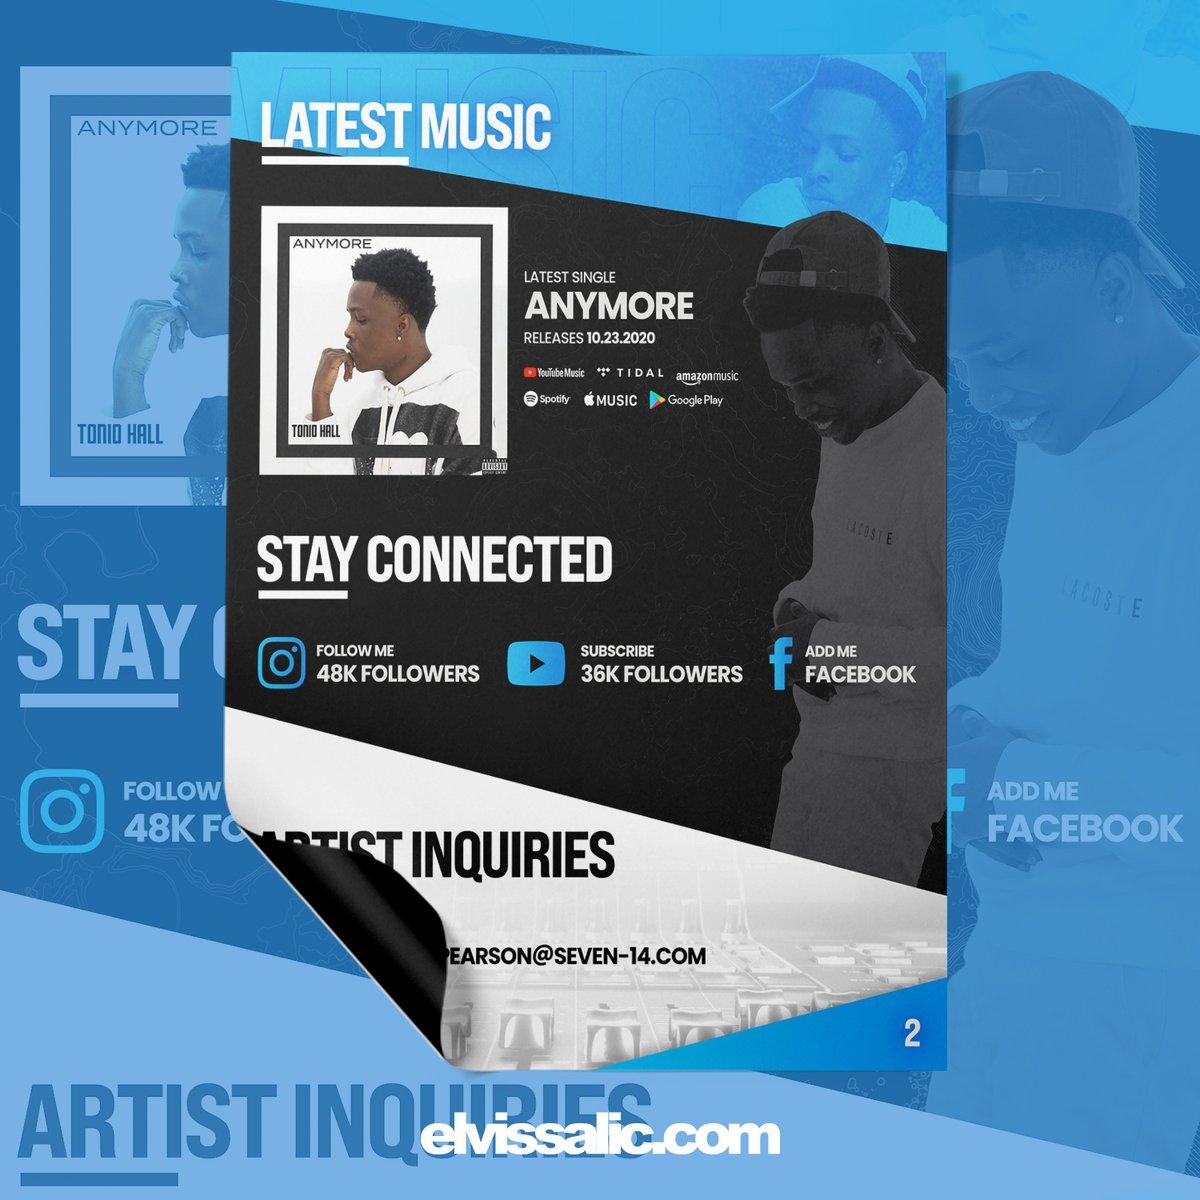 EPK PDF design for Tonio Hall  #graphicdesign #EPK #artist #producer  #music #electronicpresskit #presskit #pressdesign #photoshop #illustrator #hiphop #typebeat #creative #IndieDistribution  #IndependentArtist #MusicLife #MusicProducer #MusicianLife #MusicIndustry #MusicBiz https://t.co/rb9vIehYQ6